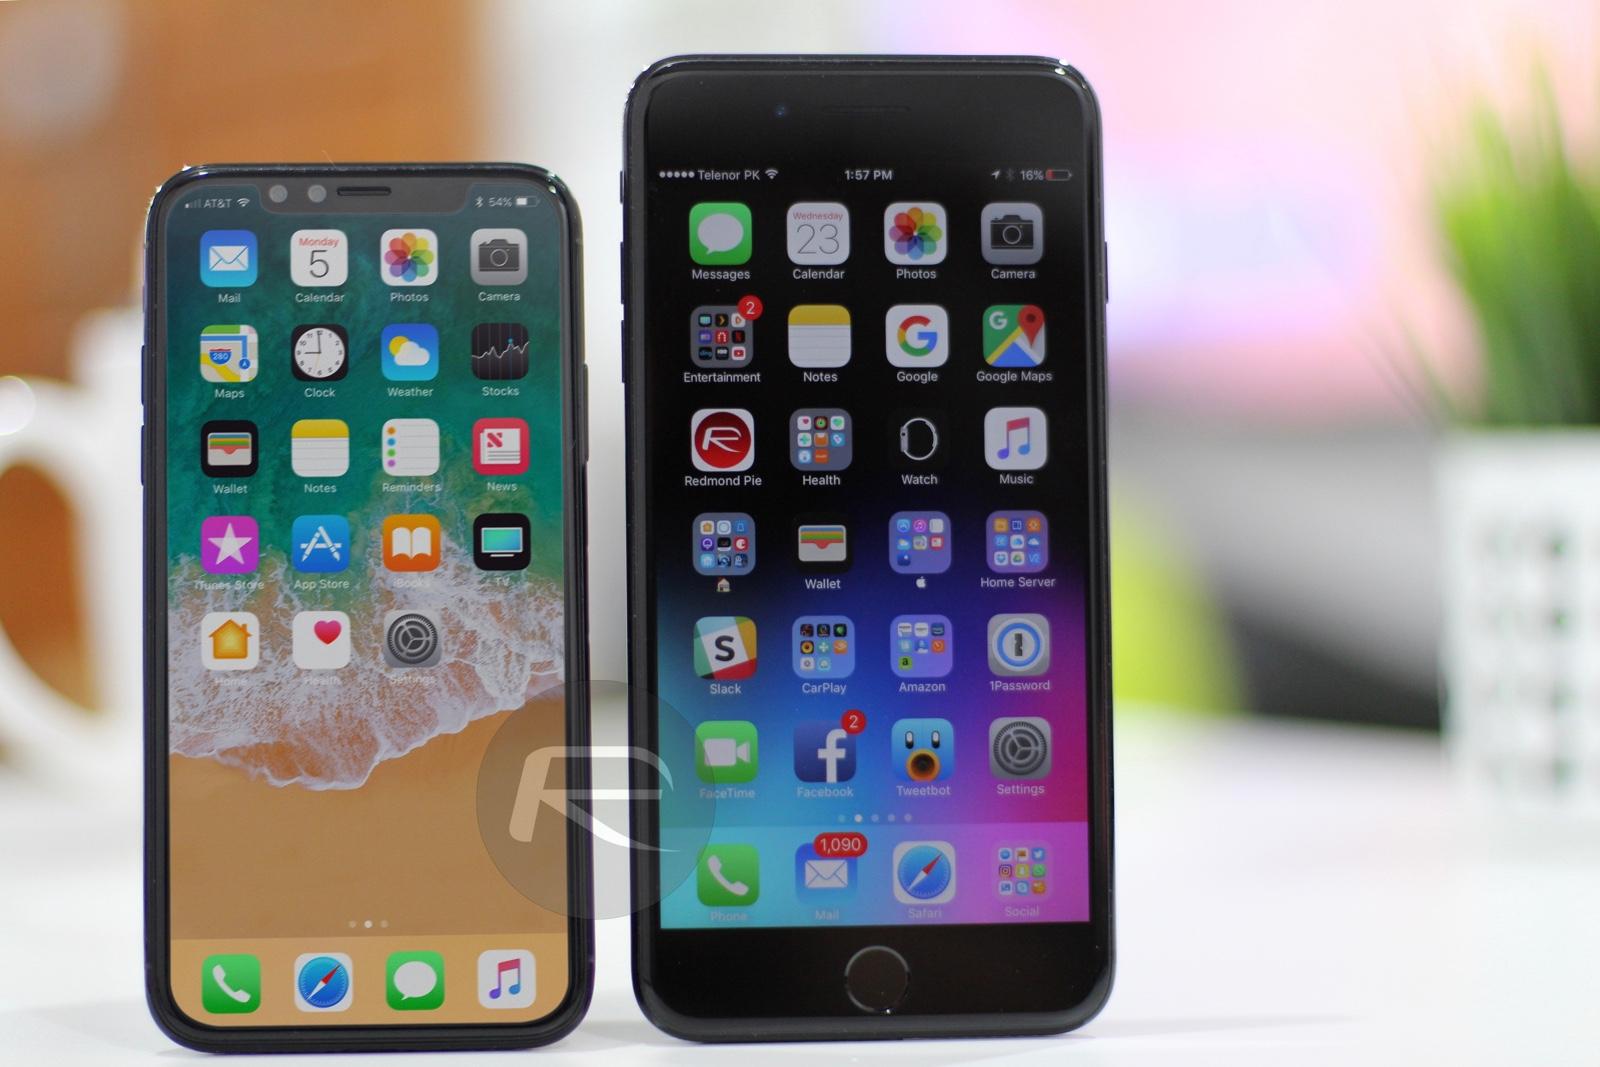 black-iPhone-8-with-iPhone-6-6s-7-Plus.jpg